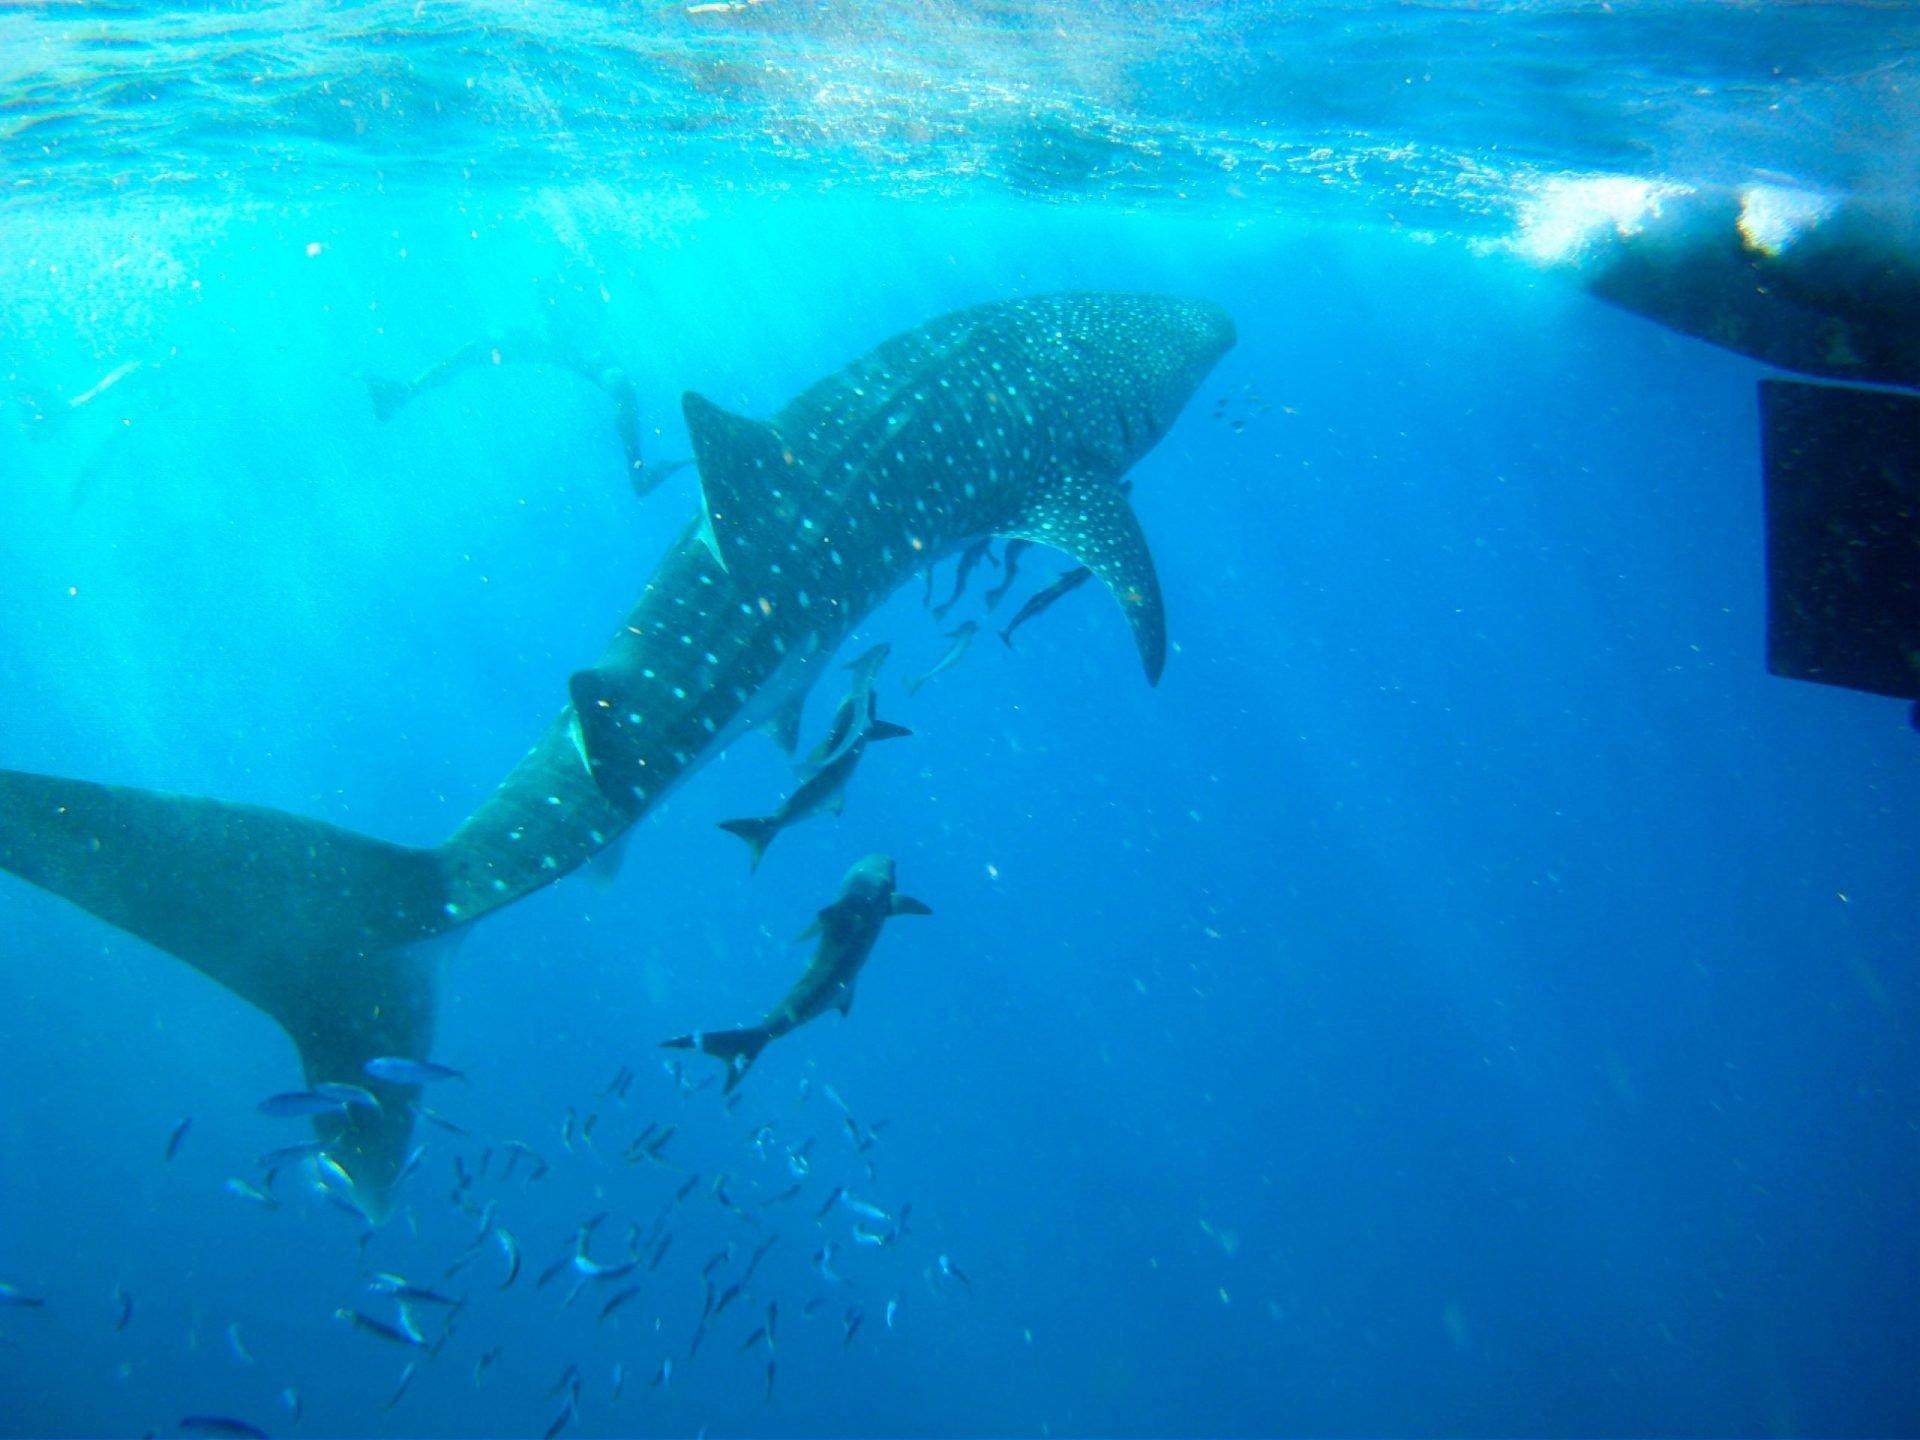 swim with whale sharks, adventure tourism, vacation, scuba, snorkel